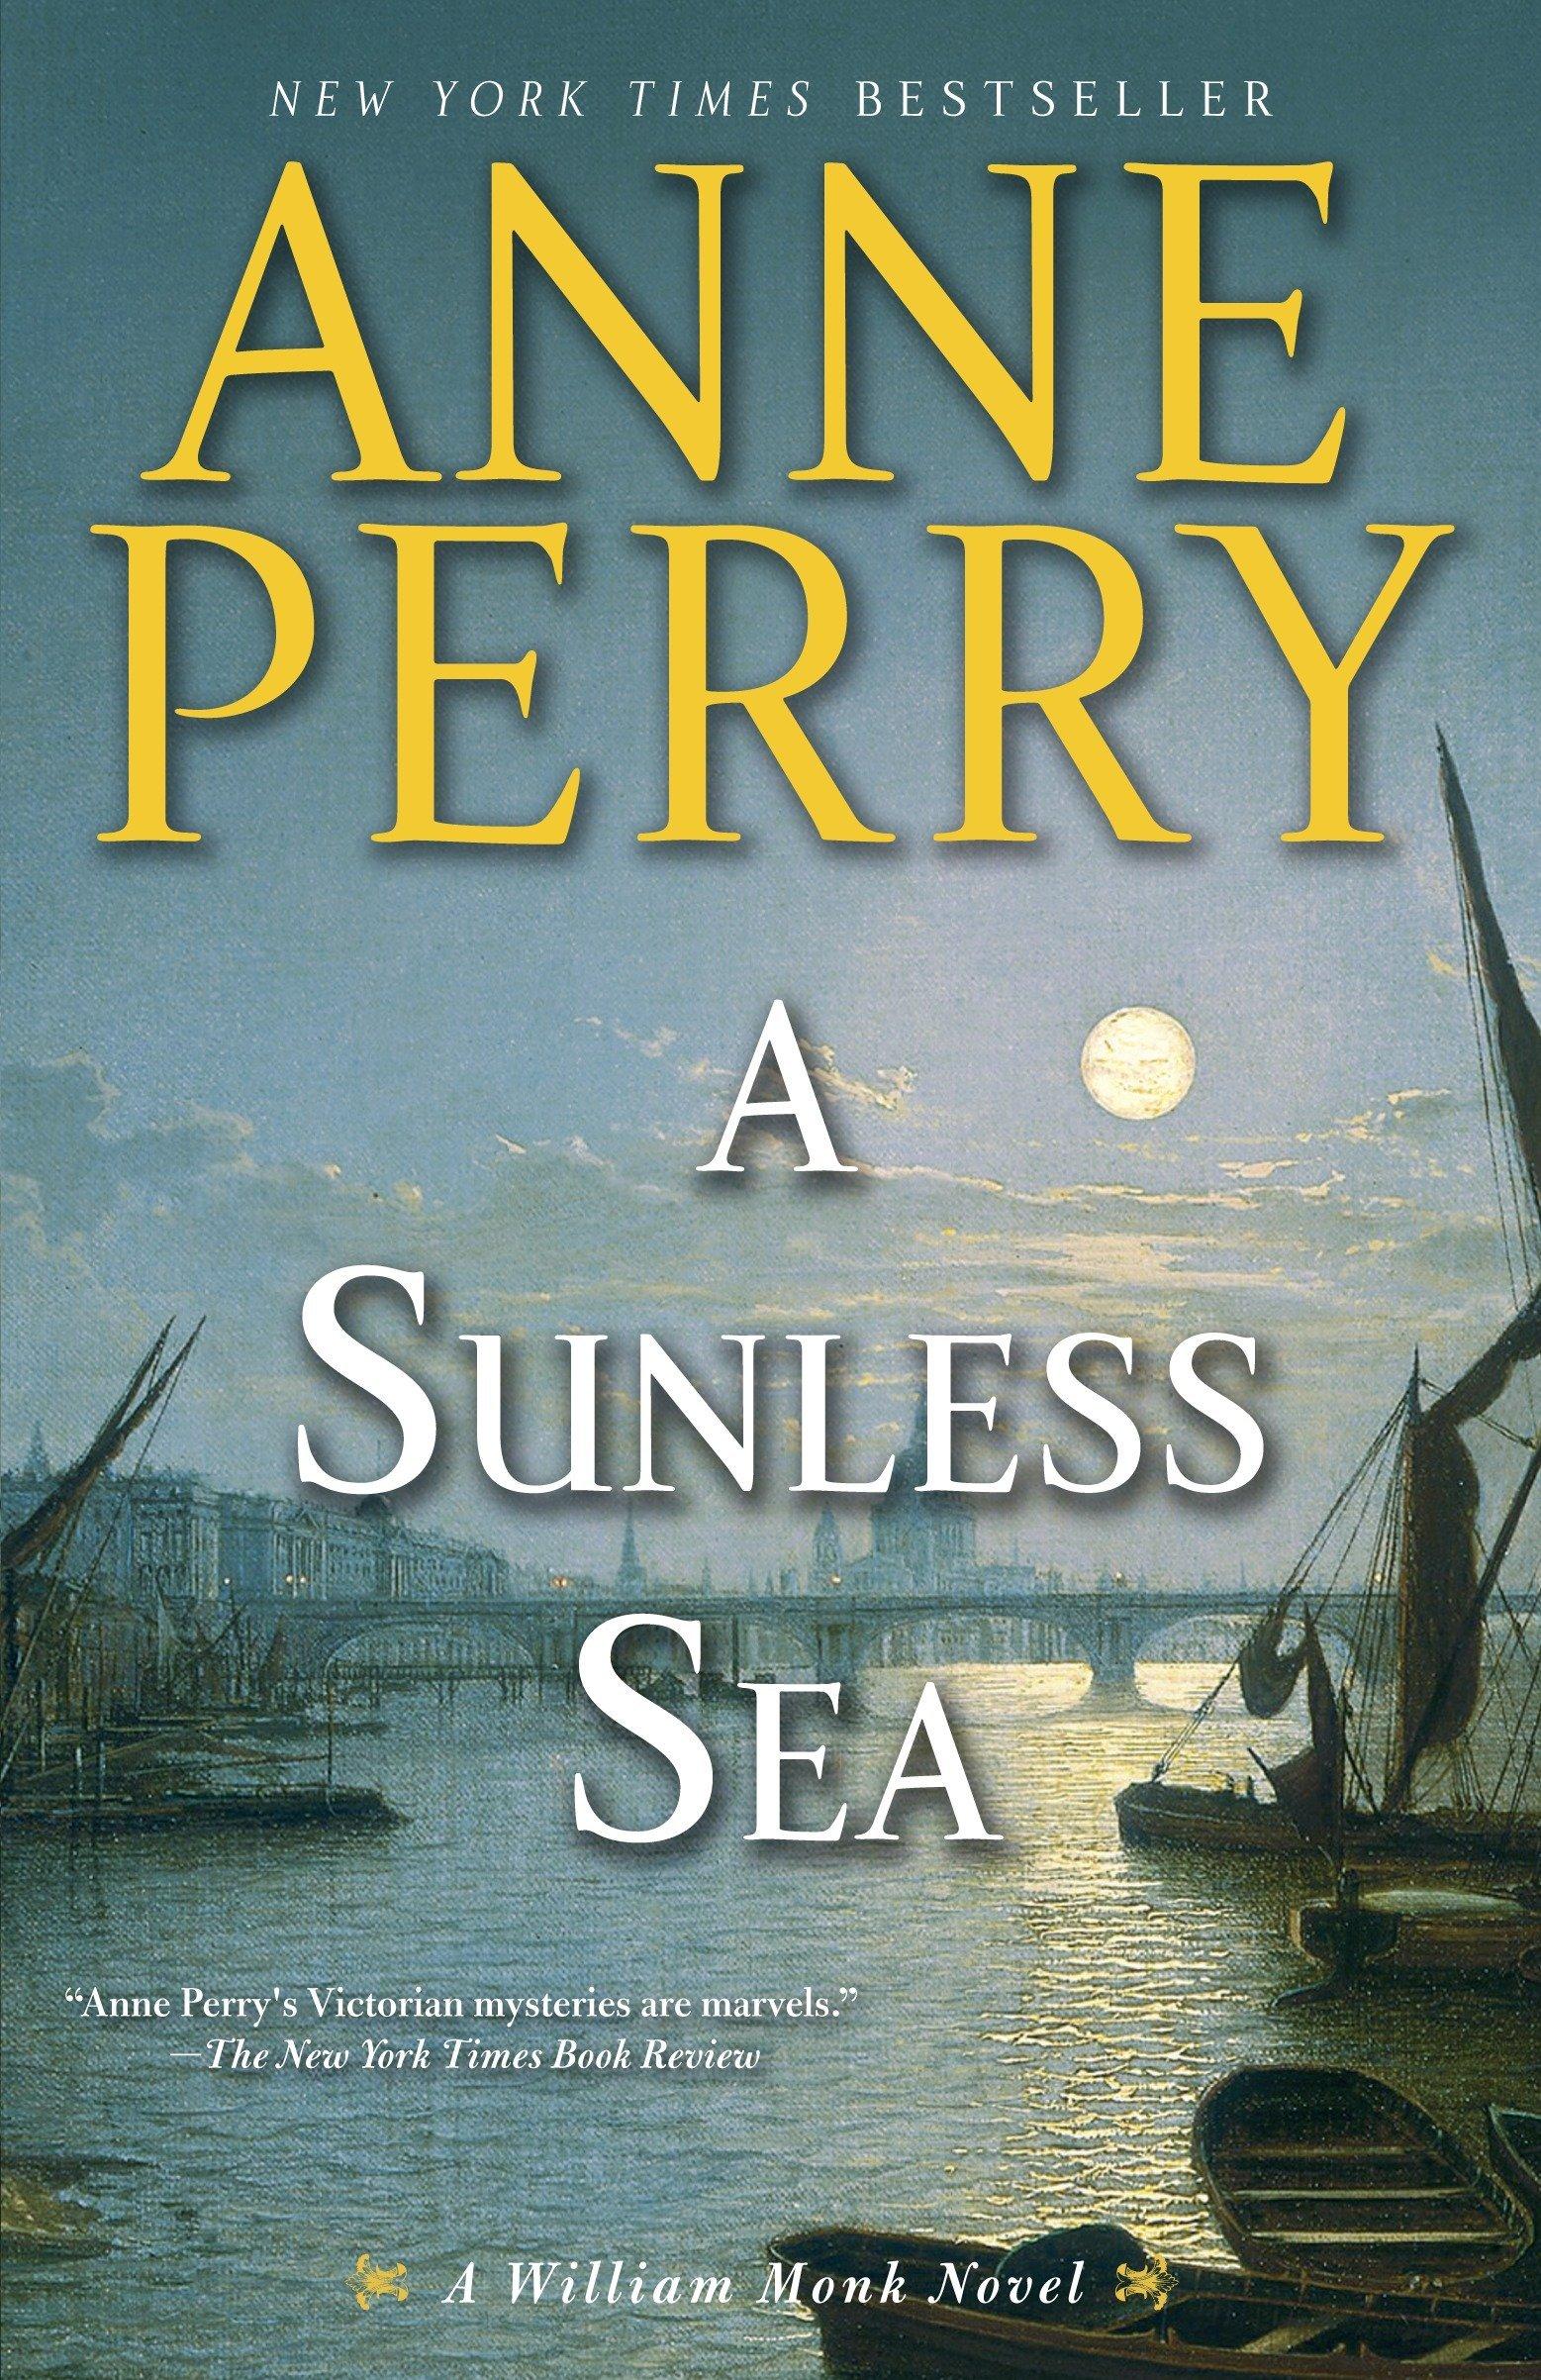 Download A Sunless Sea: A William Monk Novel ebook